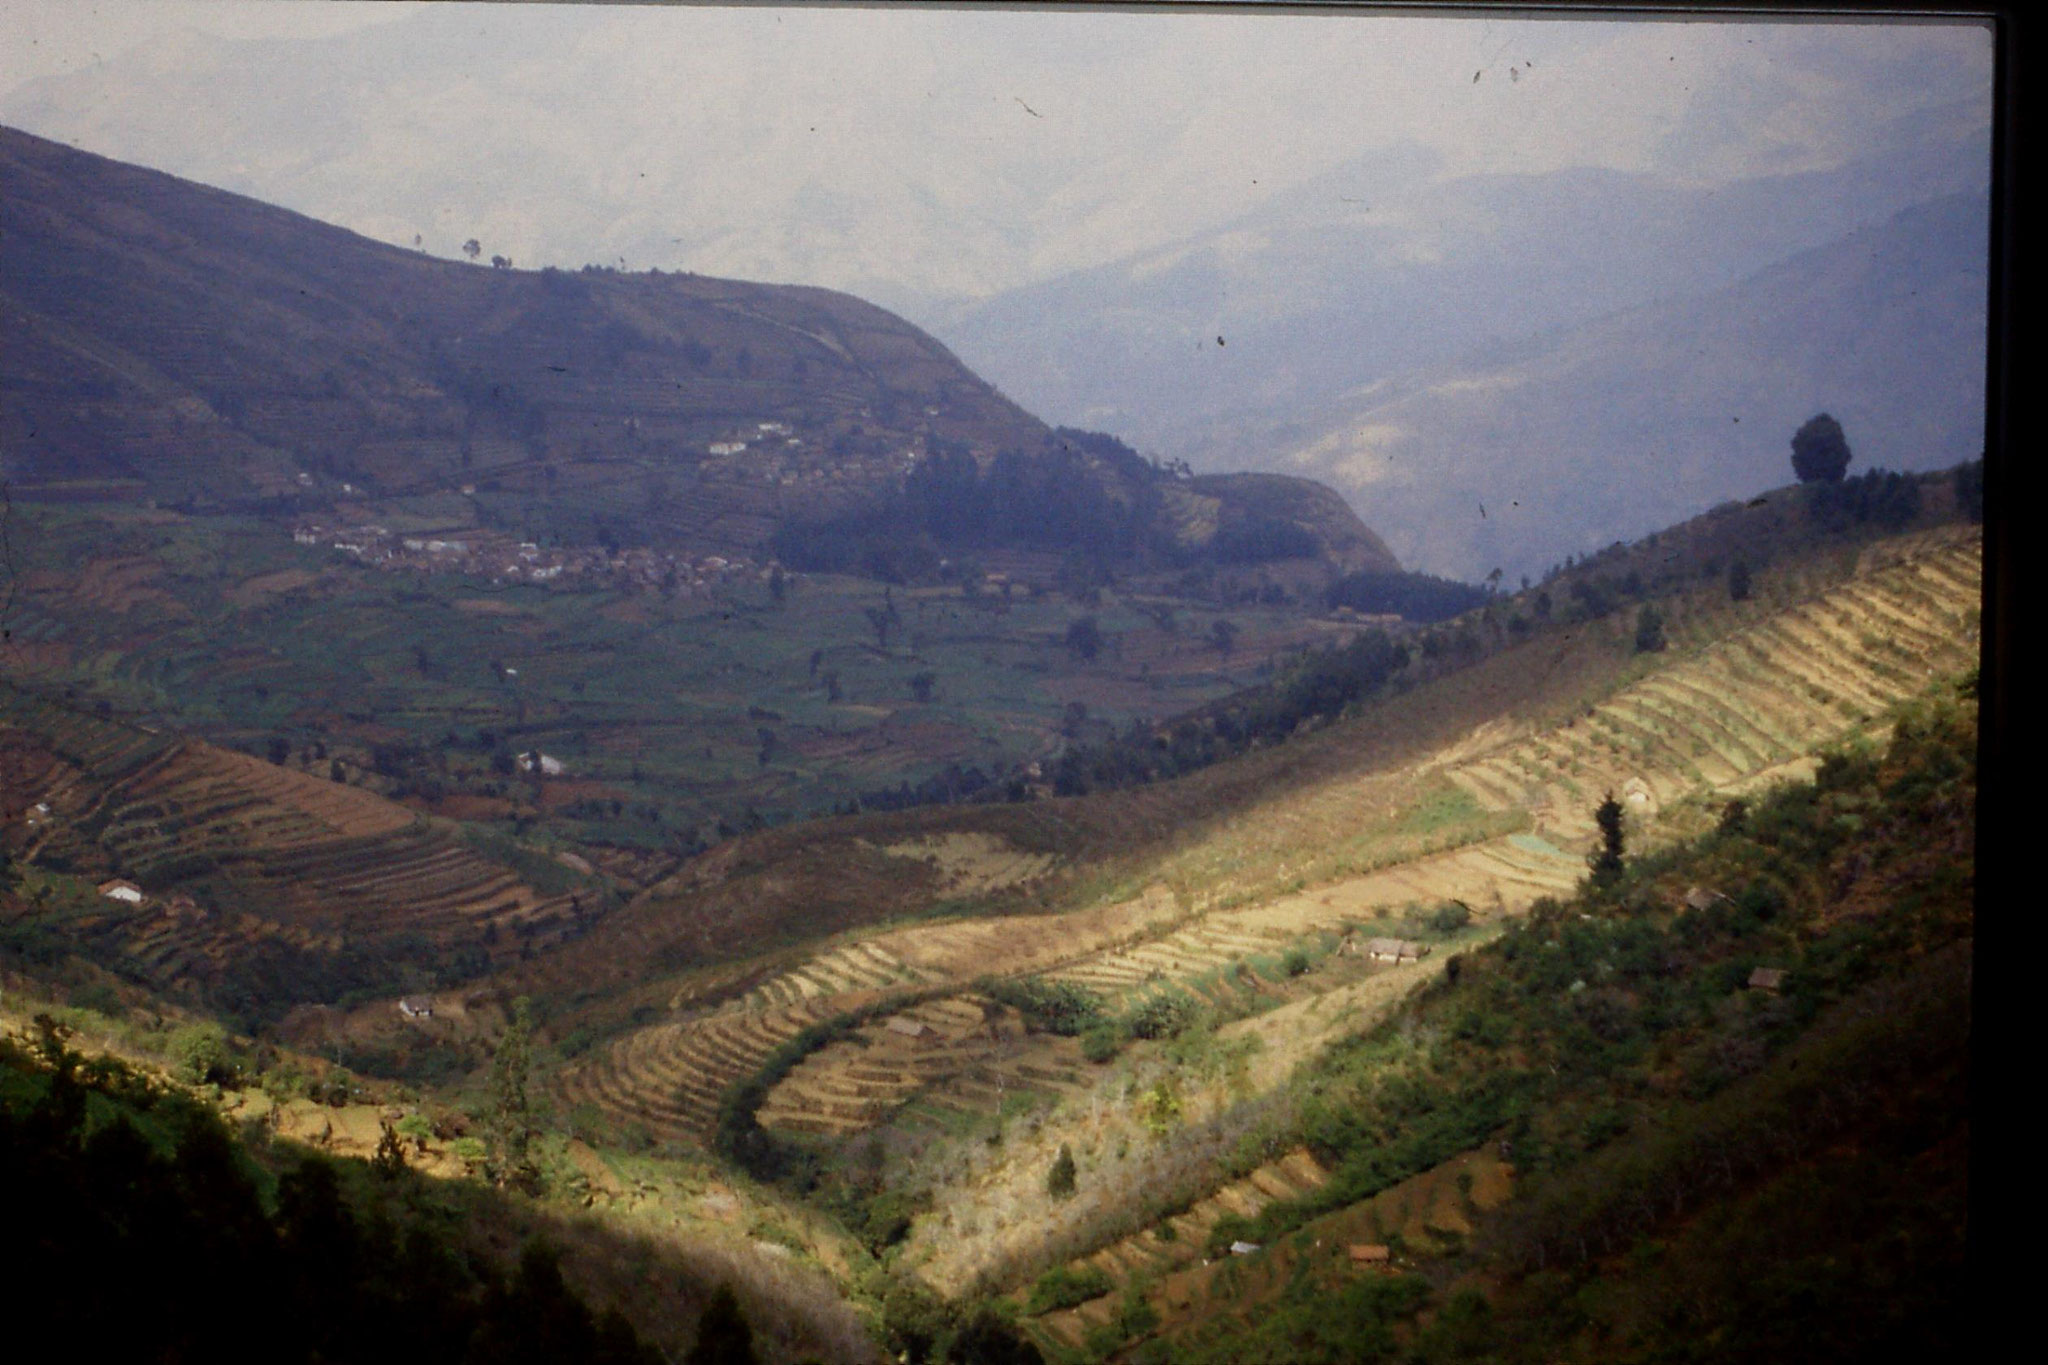 104/24: 20/2/1990 Vilpatti village and surroundings from Kodai road